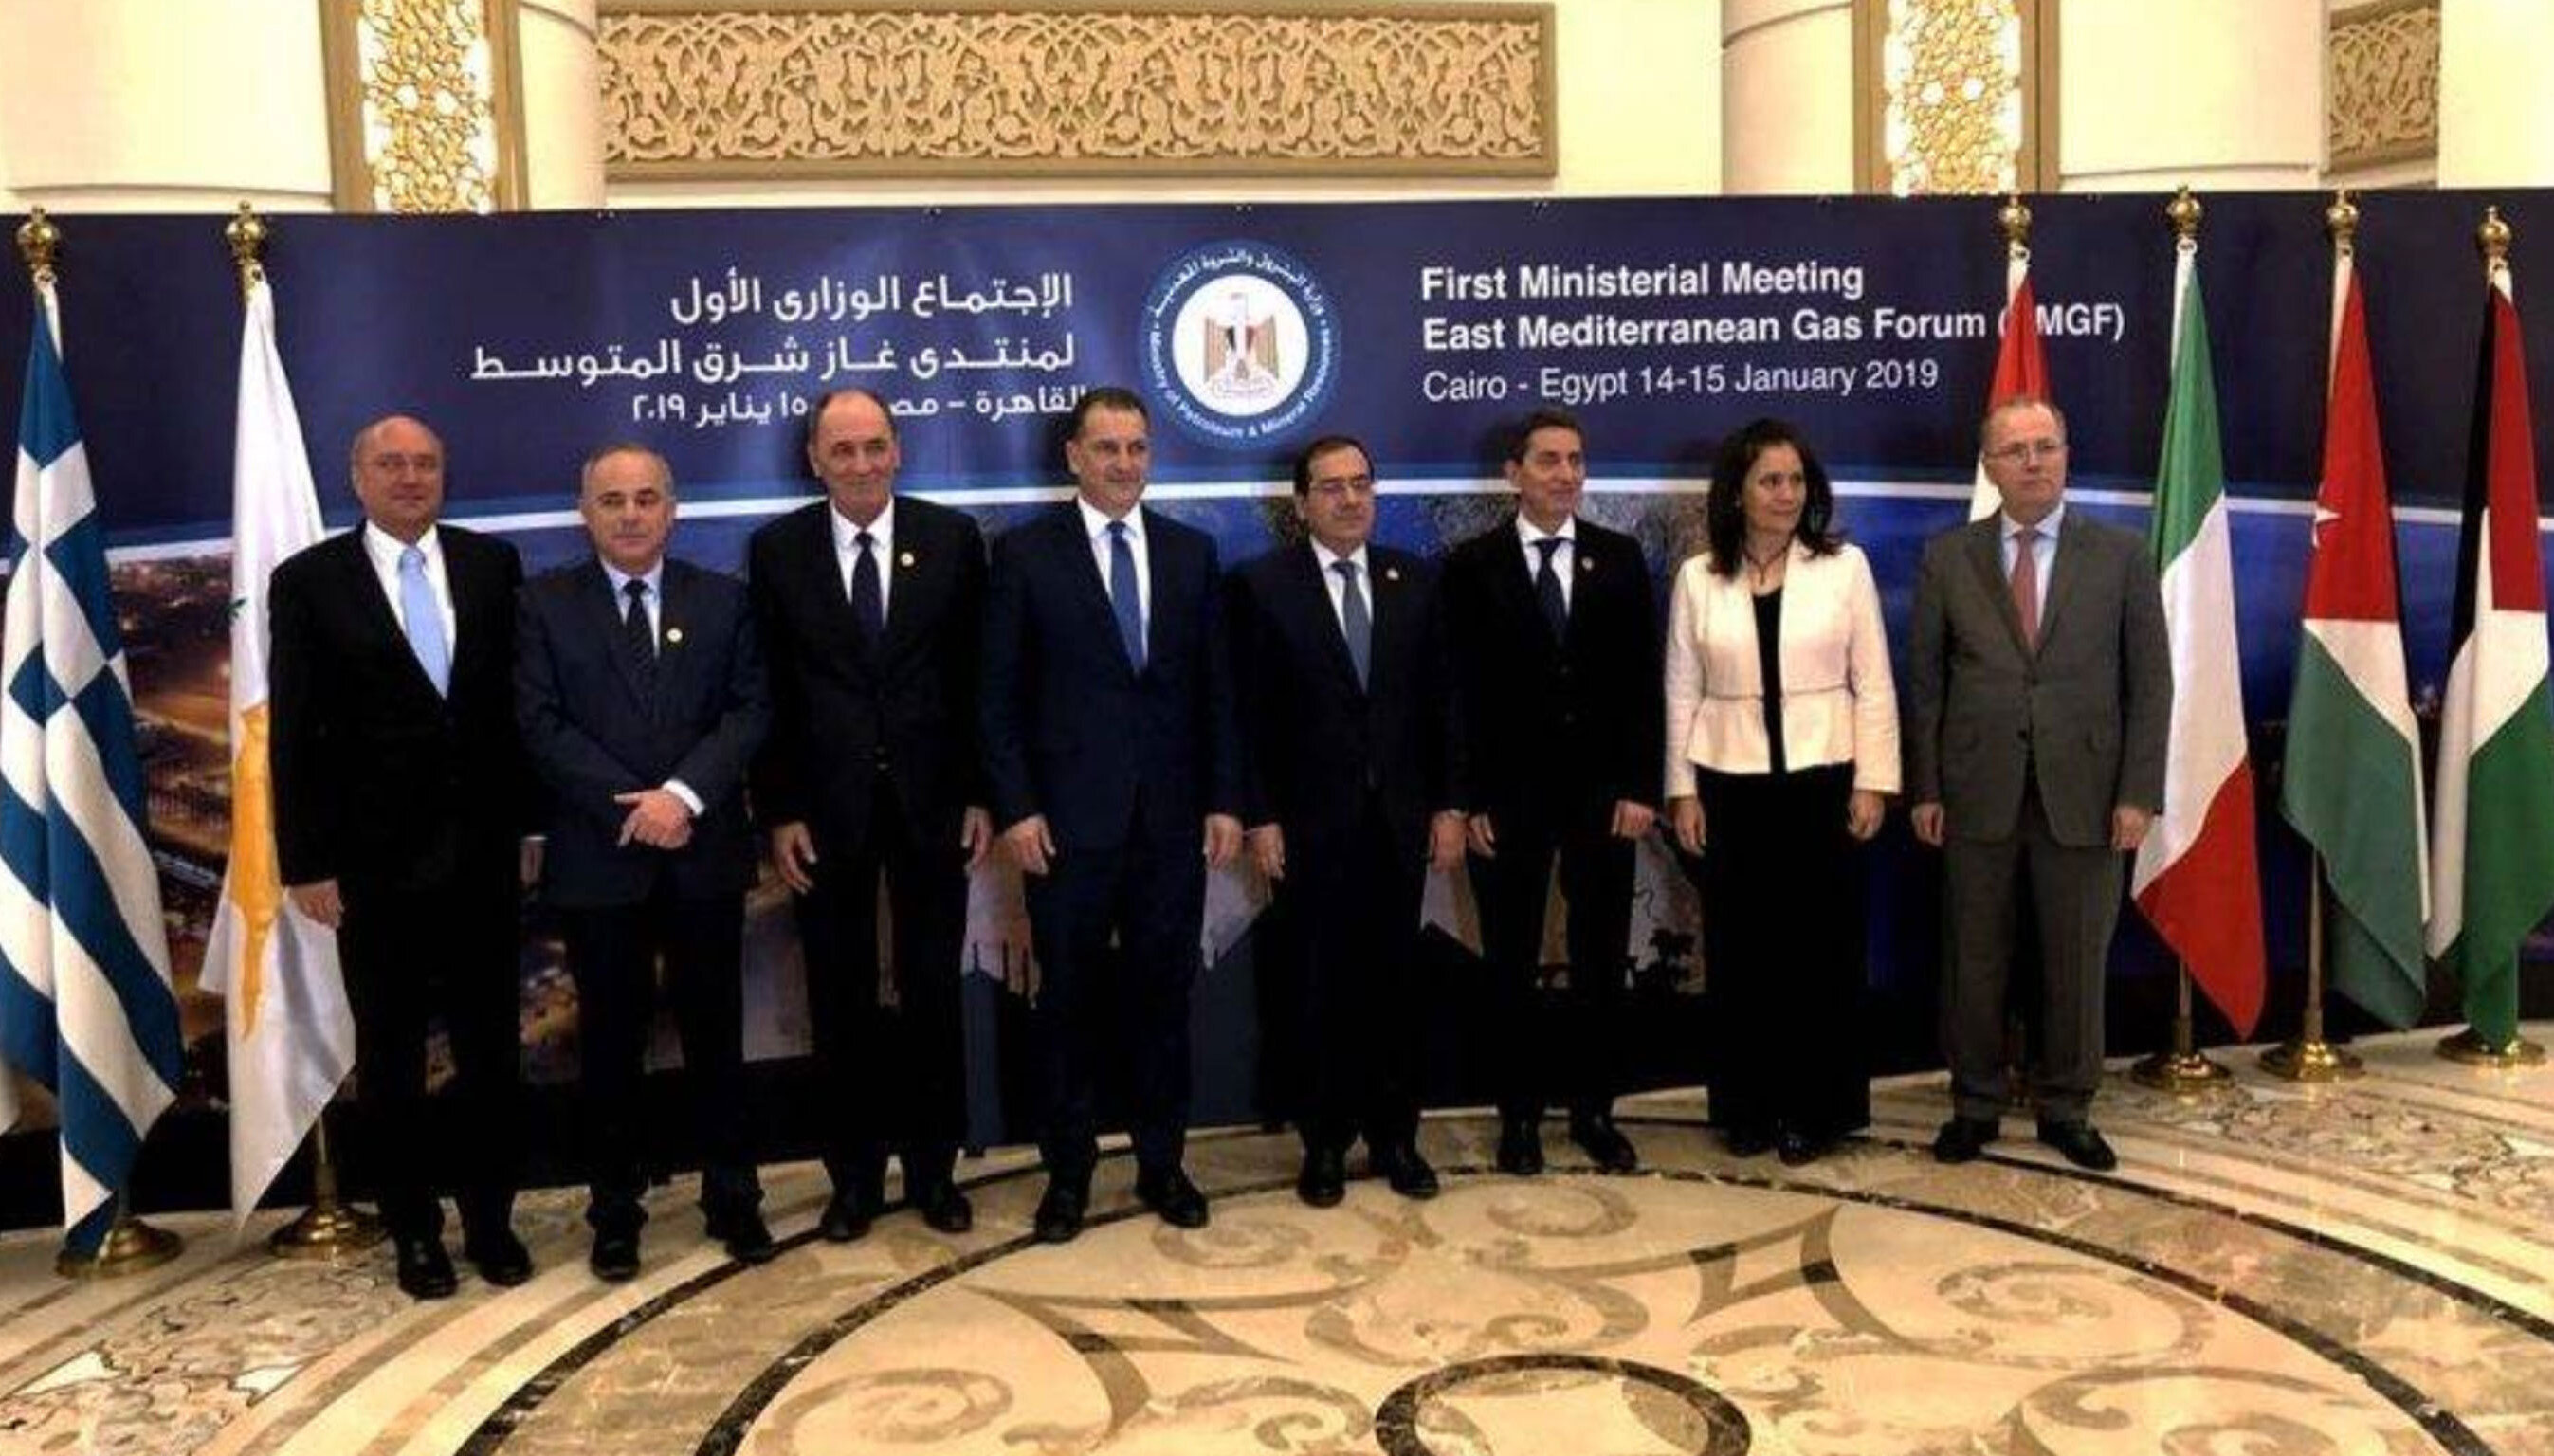 Mısır, İsrail, Yunanistan, Kıbrıs, İtalya ve Ürdün'ün oluşturduğu Doğu Akdeniz Gaz Forumu.